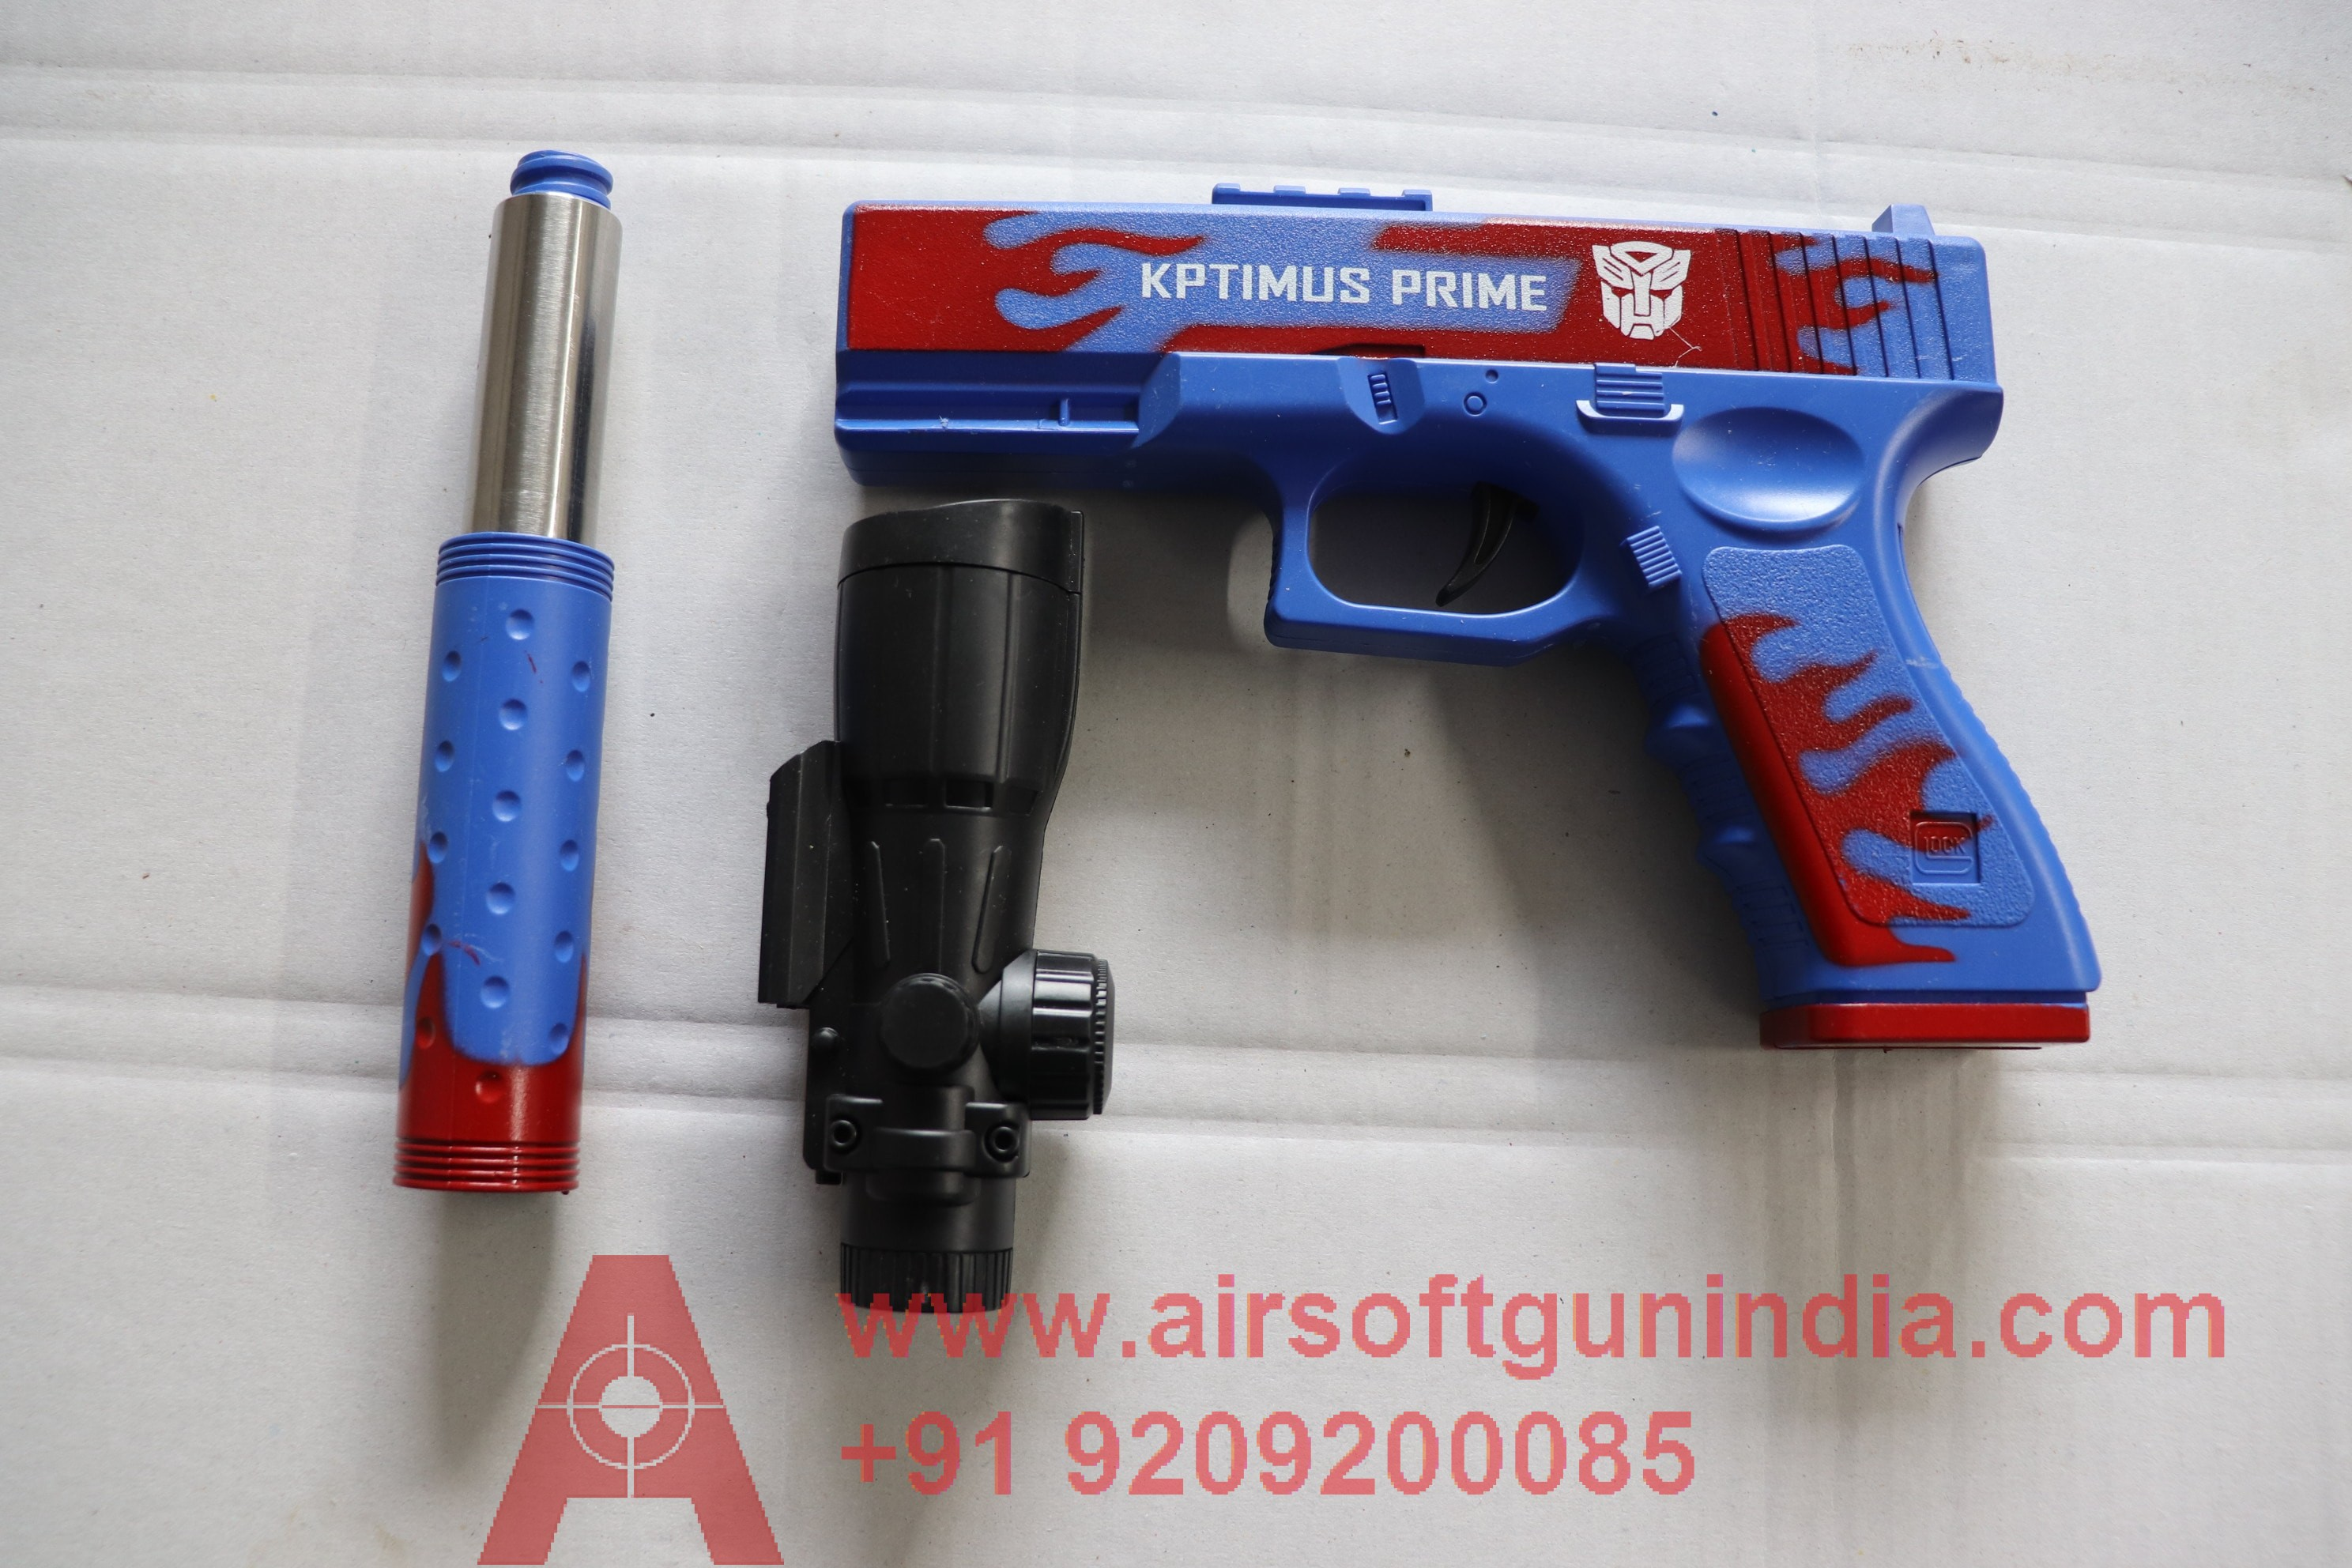 GLOCK 17 BLUE  AIRSOFT SPRING PISTOL BY AIRSOFT GUN INDIA